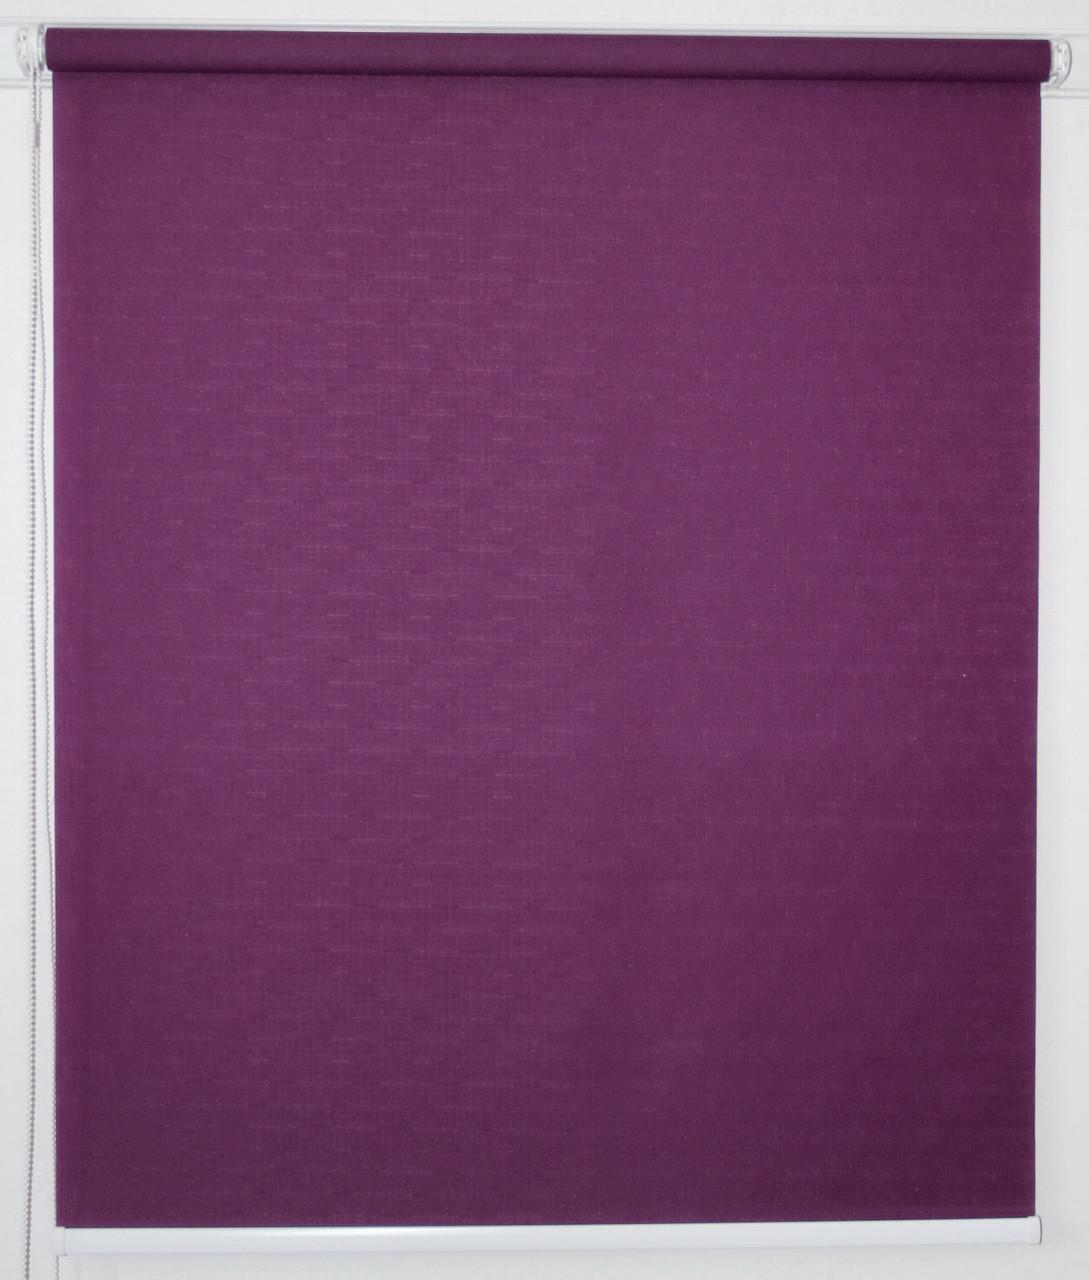 Рулонная штора 1200*1500 Лён 613 Фиолетовый